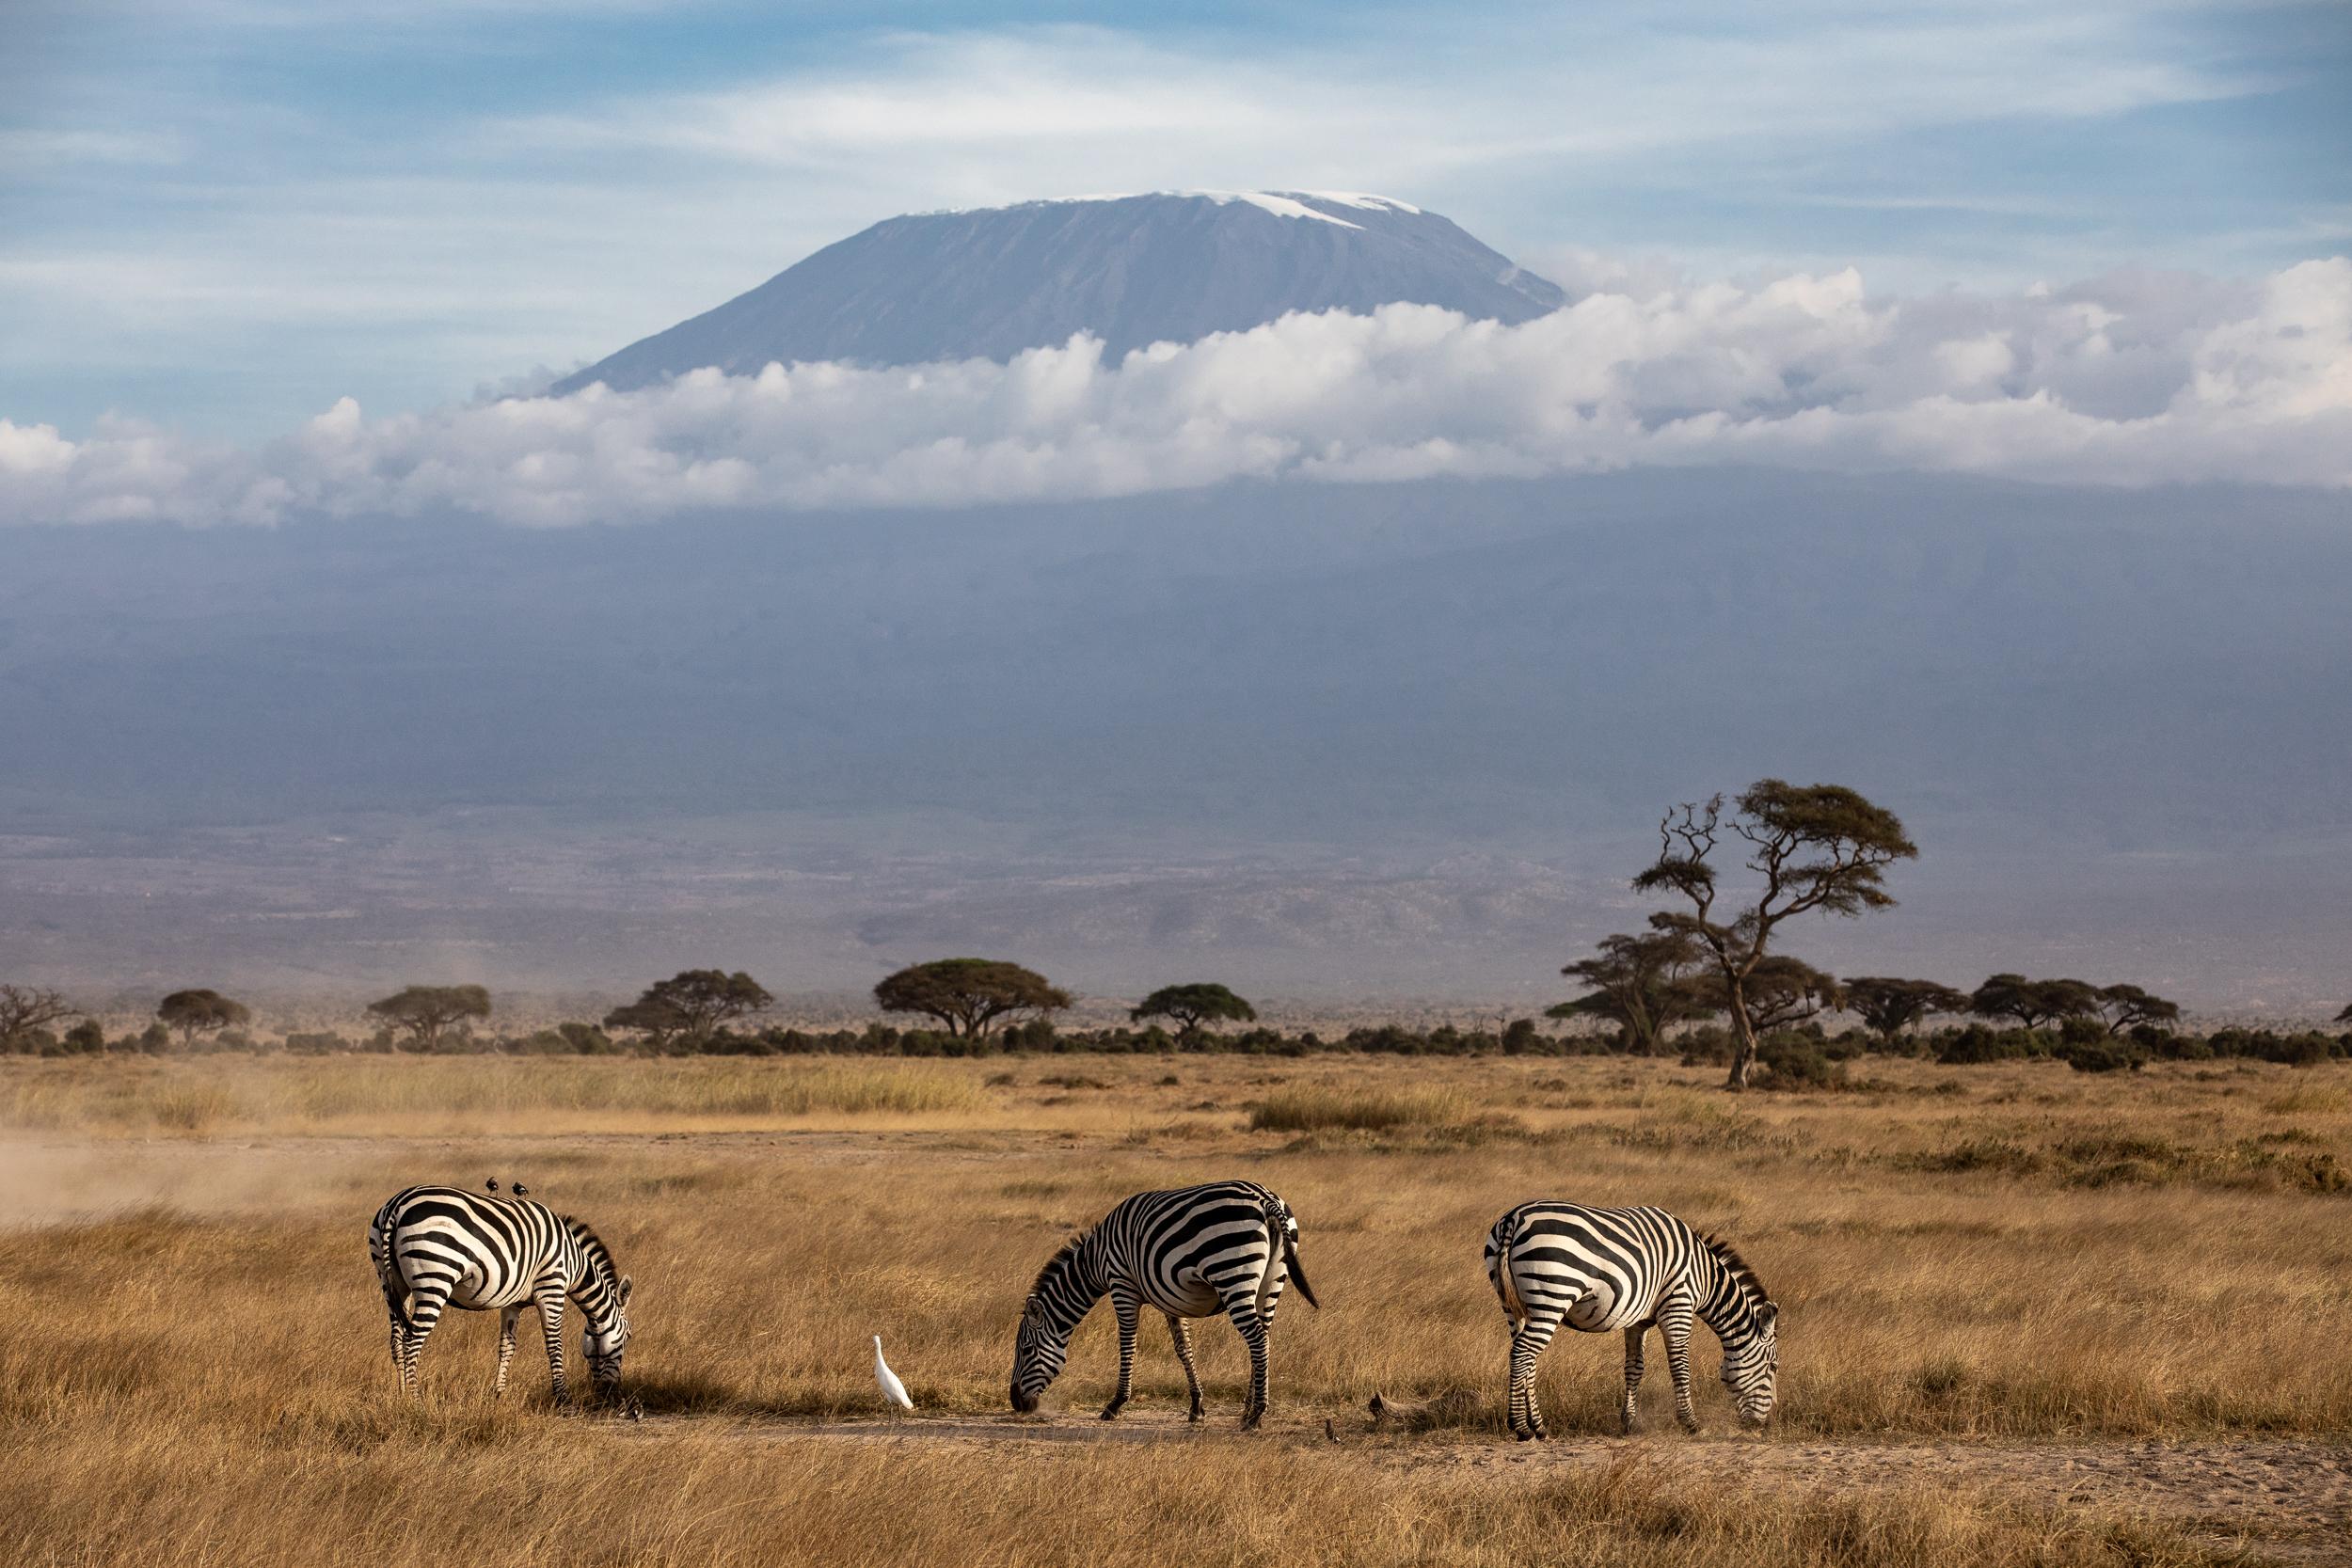 Mount Kilimanjaro emerges from clouds behind Zebra in Amboseli National Park. September 2018 - Amboseli, Kenya